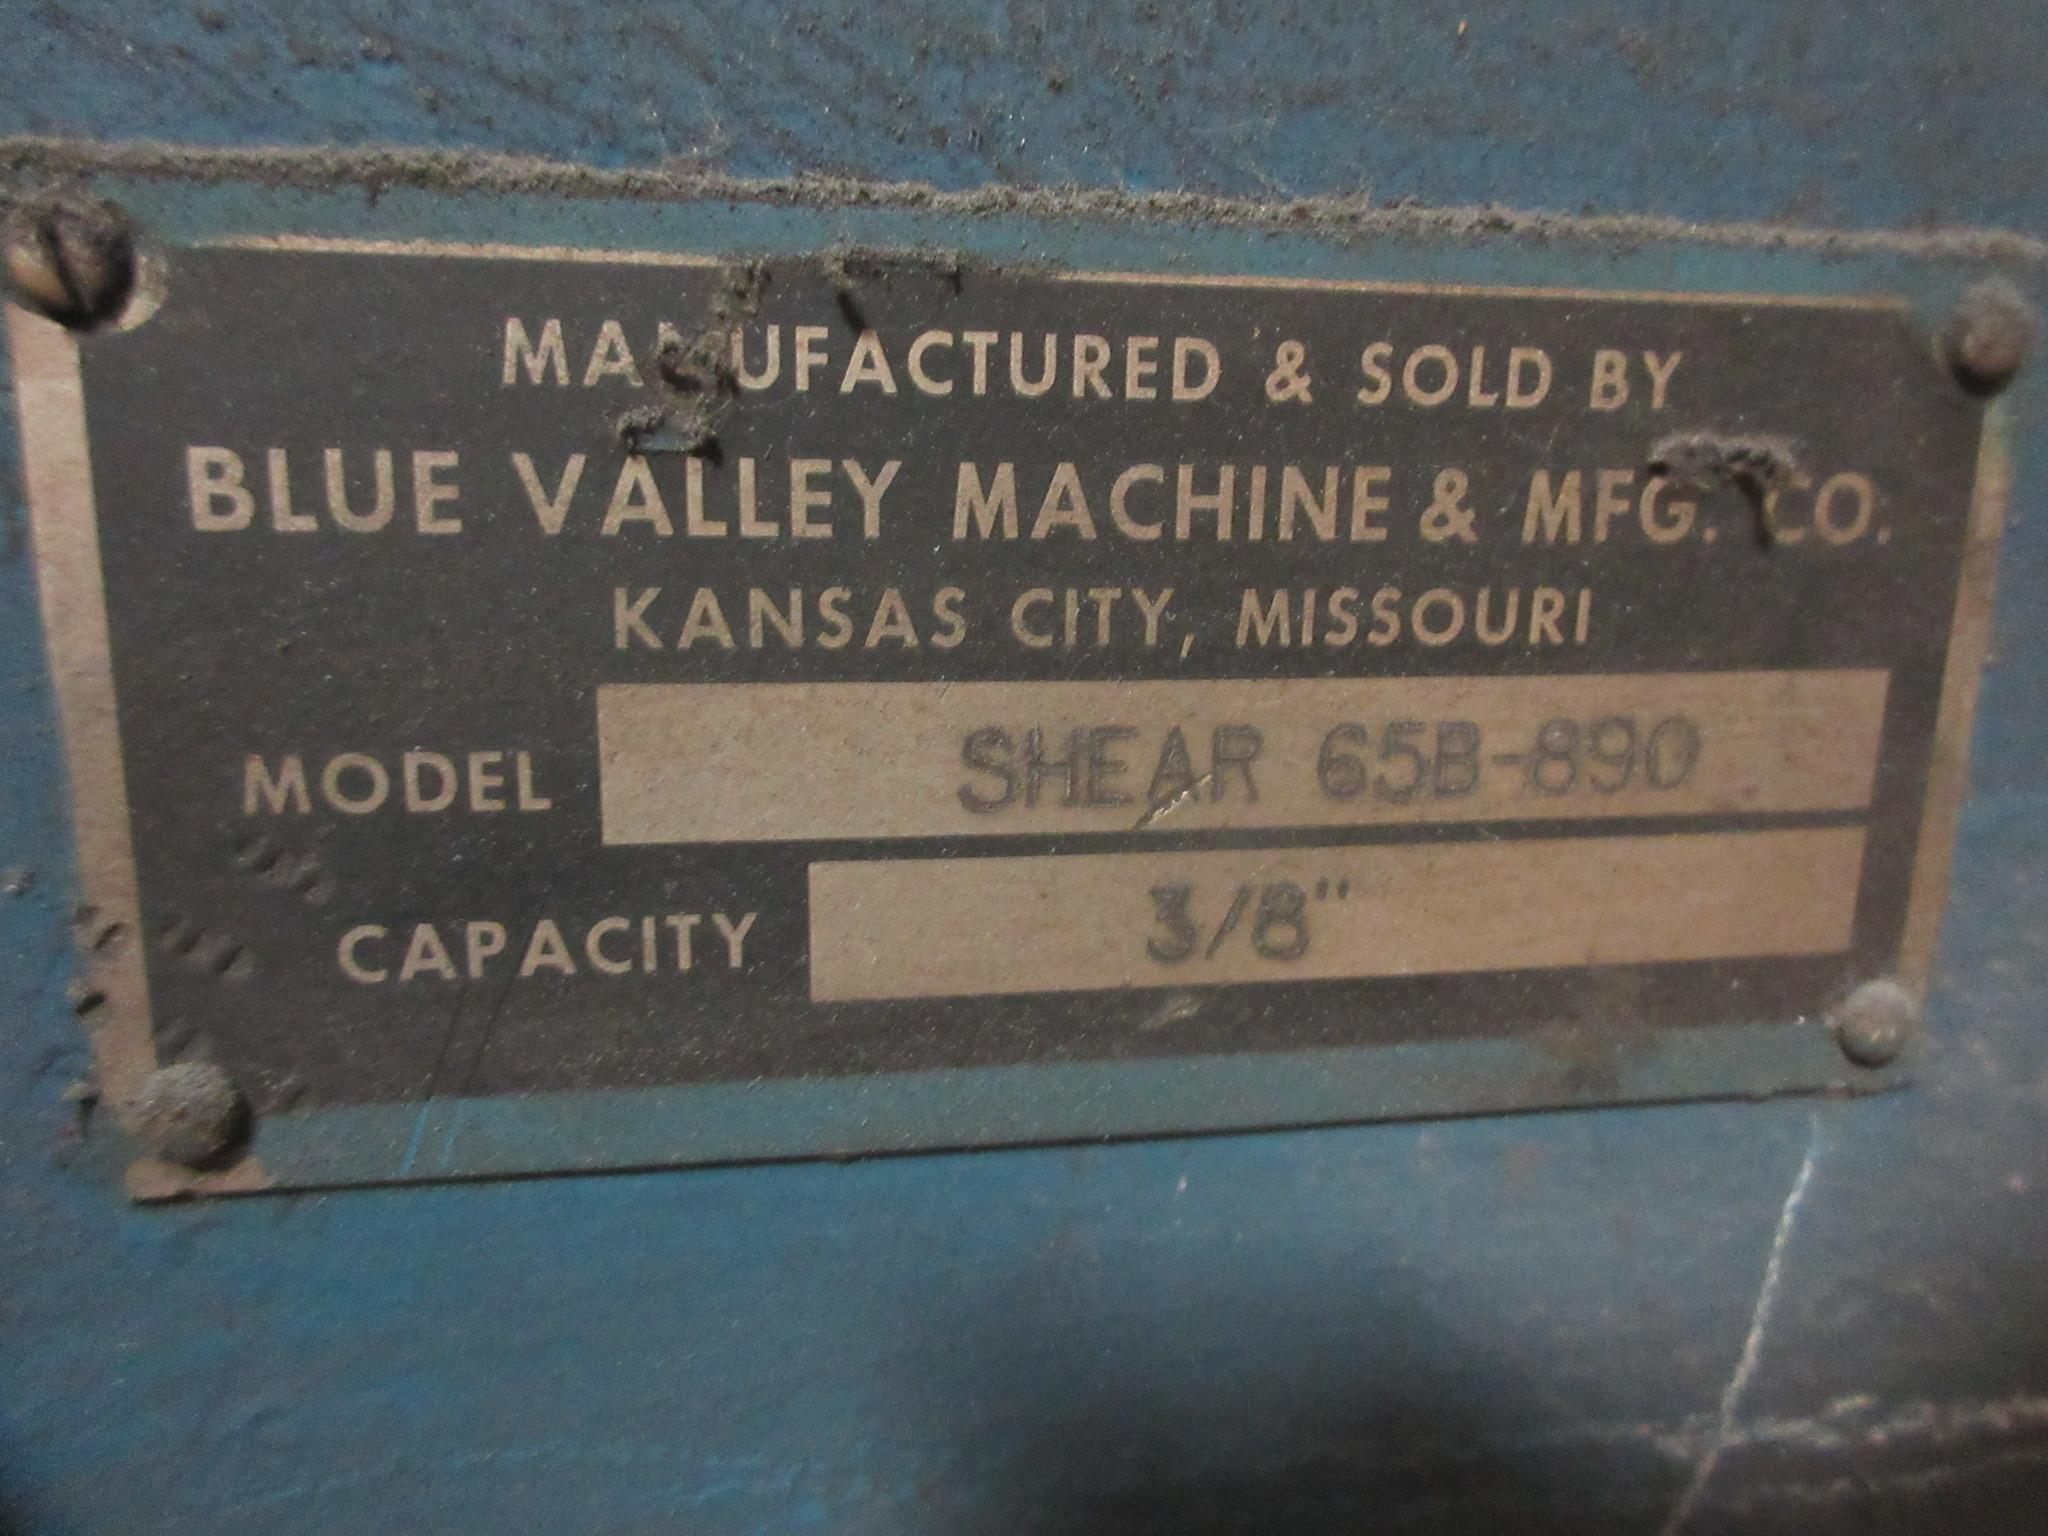 "LARGE CAPACITY CIRCLE SHEAR, 12' DIAMETER, 3/8"" MAX THICKNESS, HARD TO FIND MACHINE"